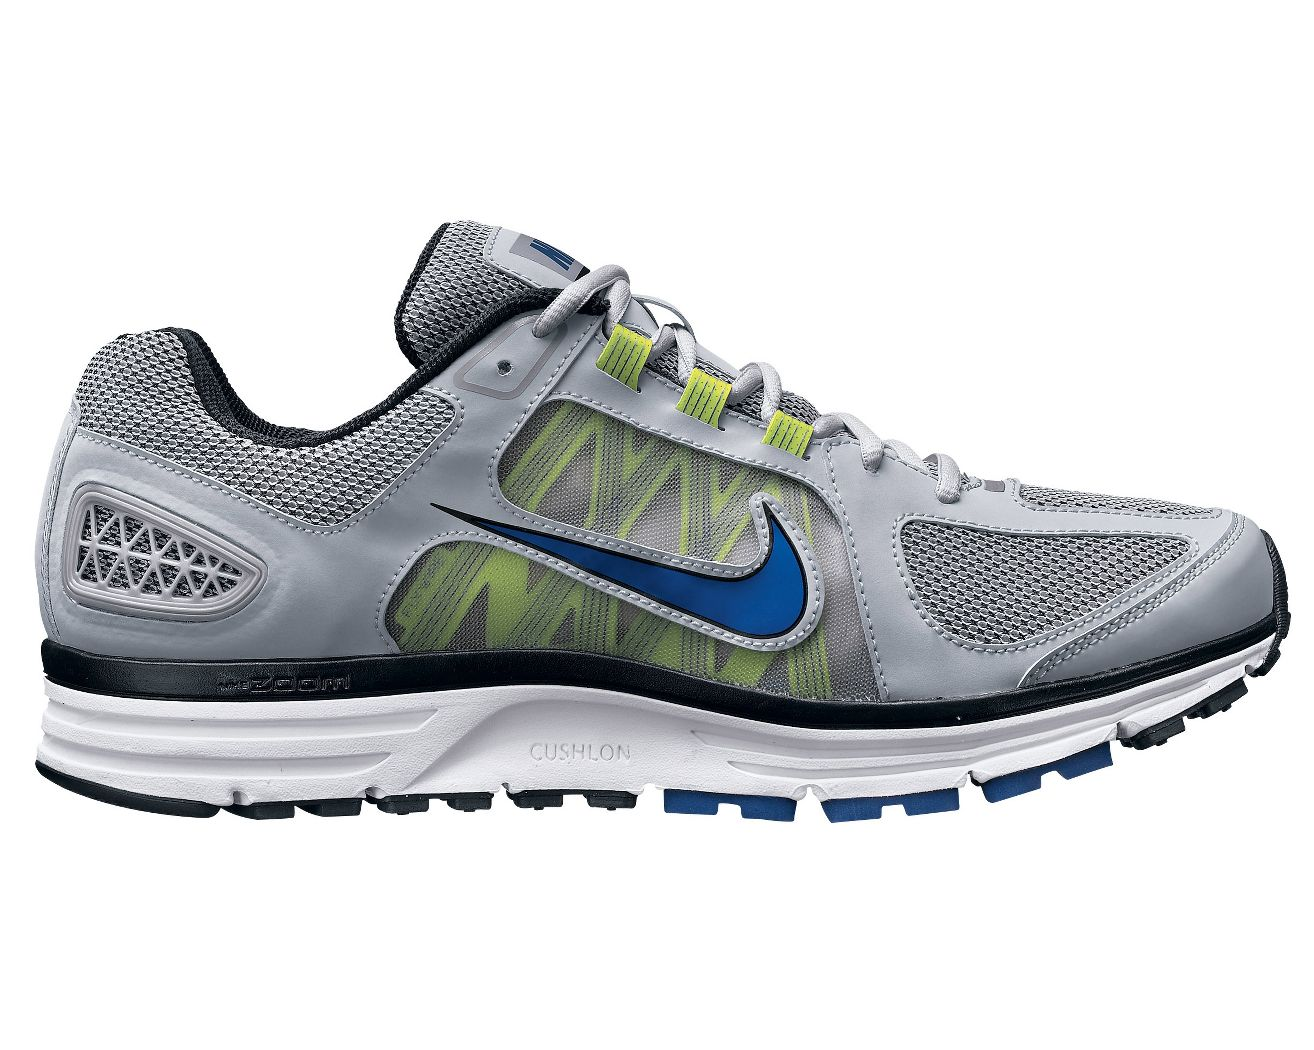 fba8bf1b1156c chaussures nike vomero 7